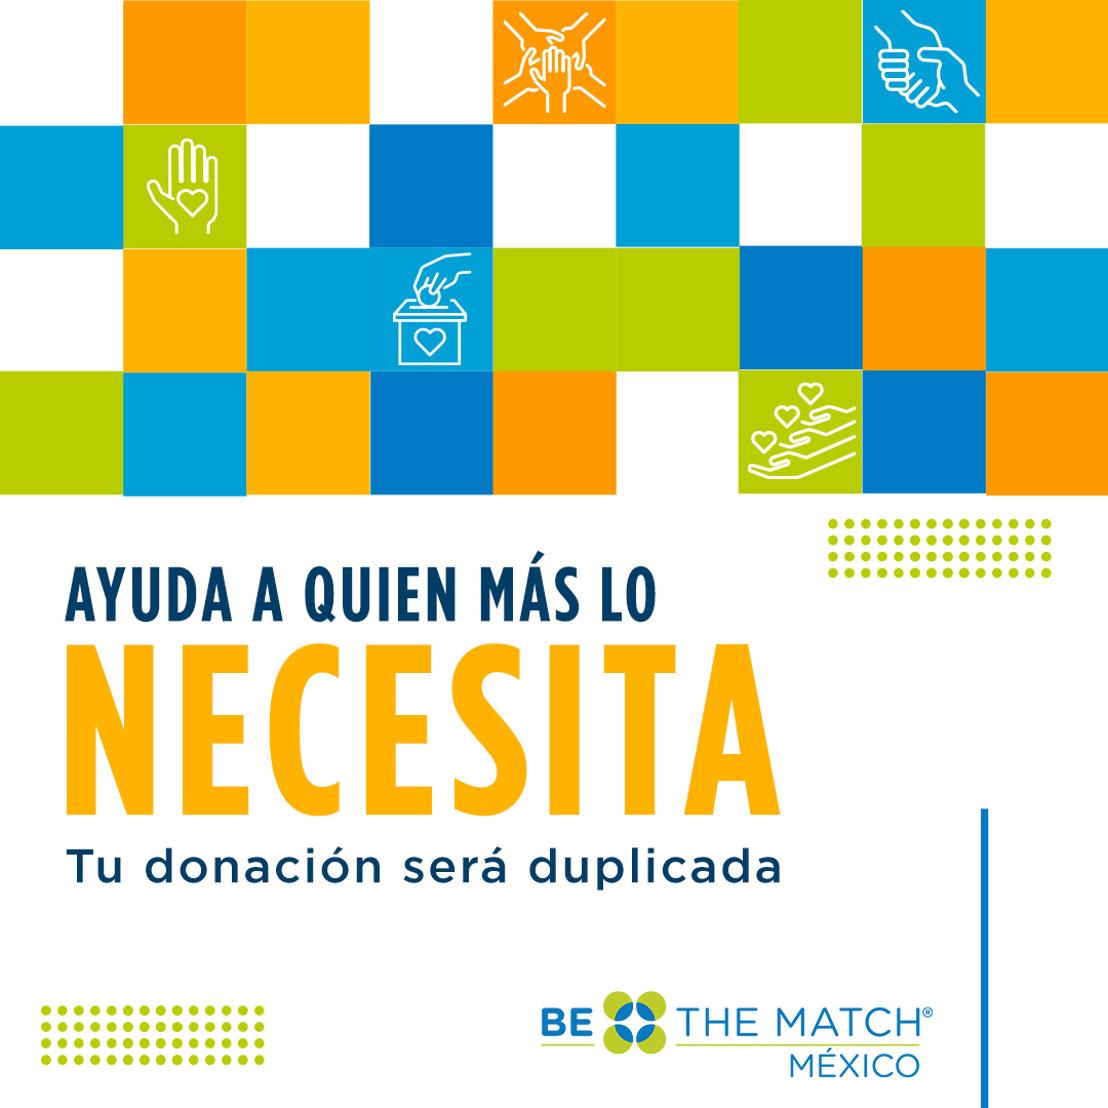 Be The Match® México busca recaudar 5 millones de pesos para apoyar a pacientes que necesitan un trasplante de médula ósea.